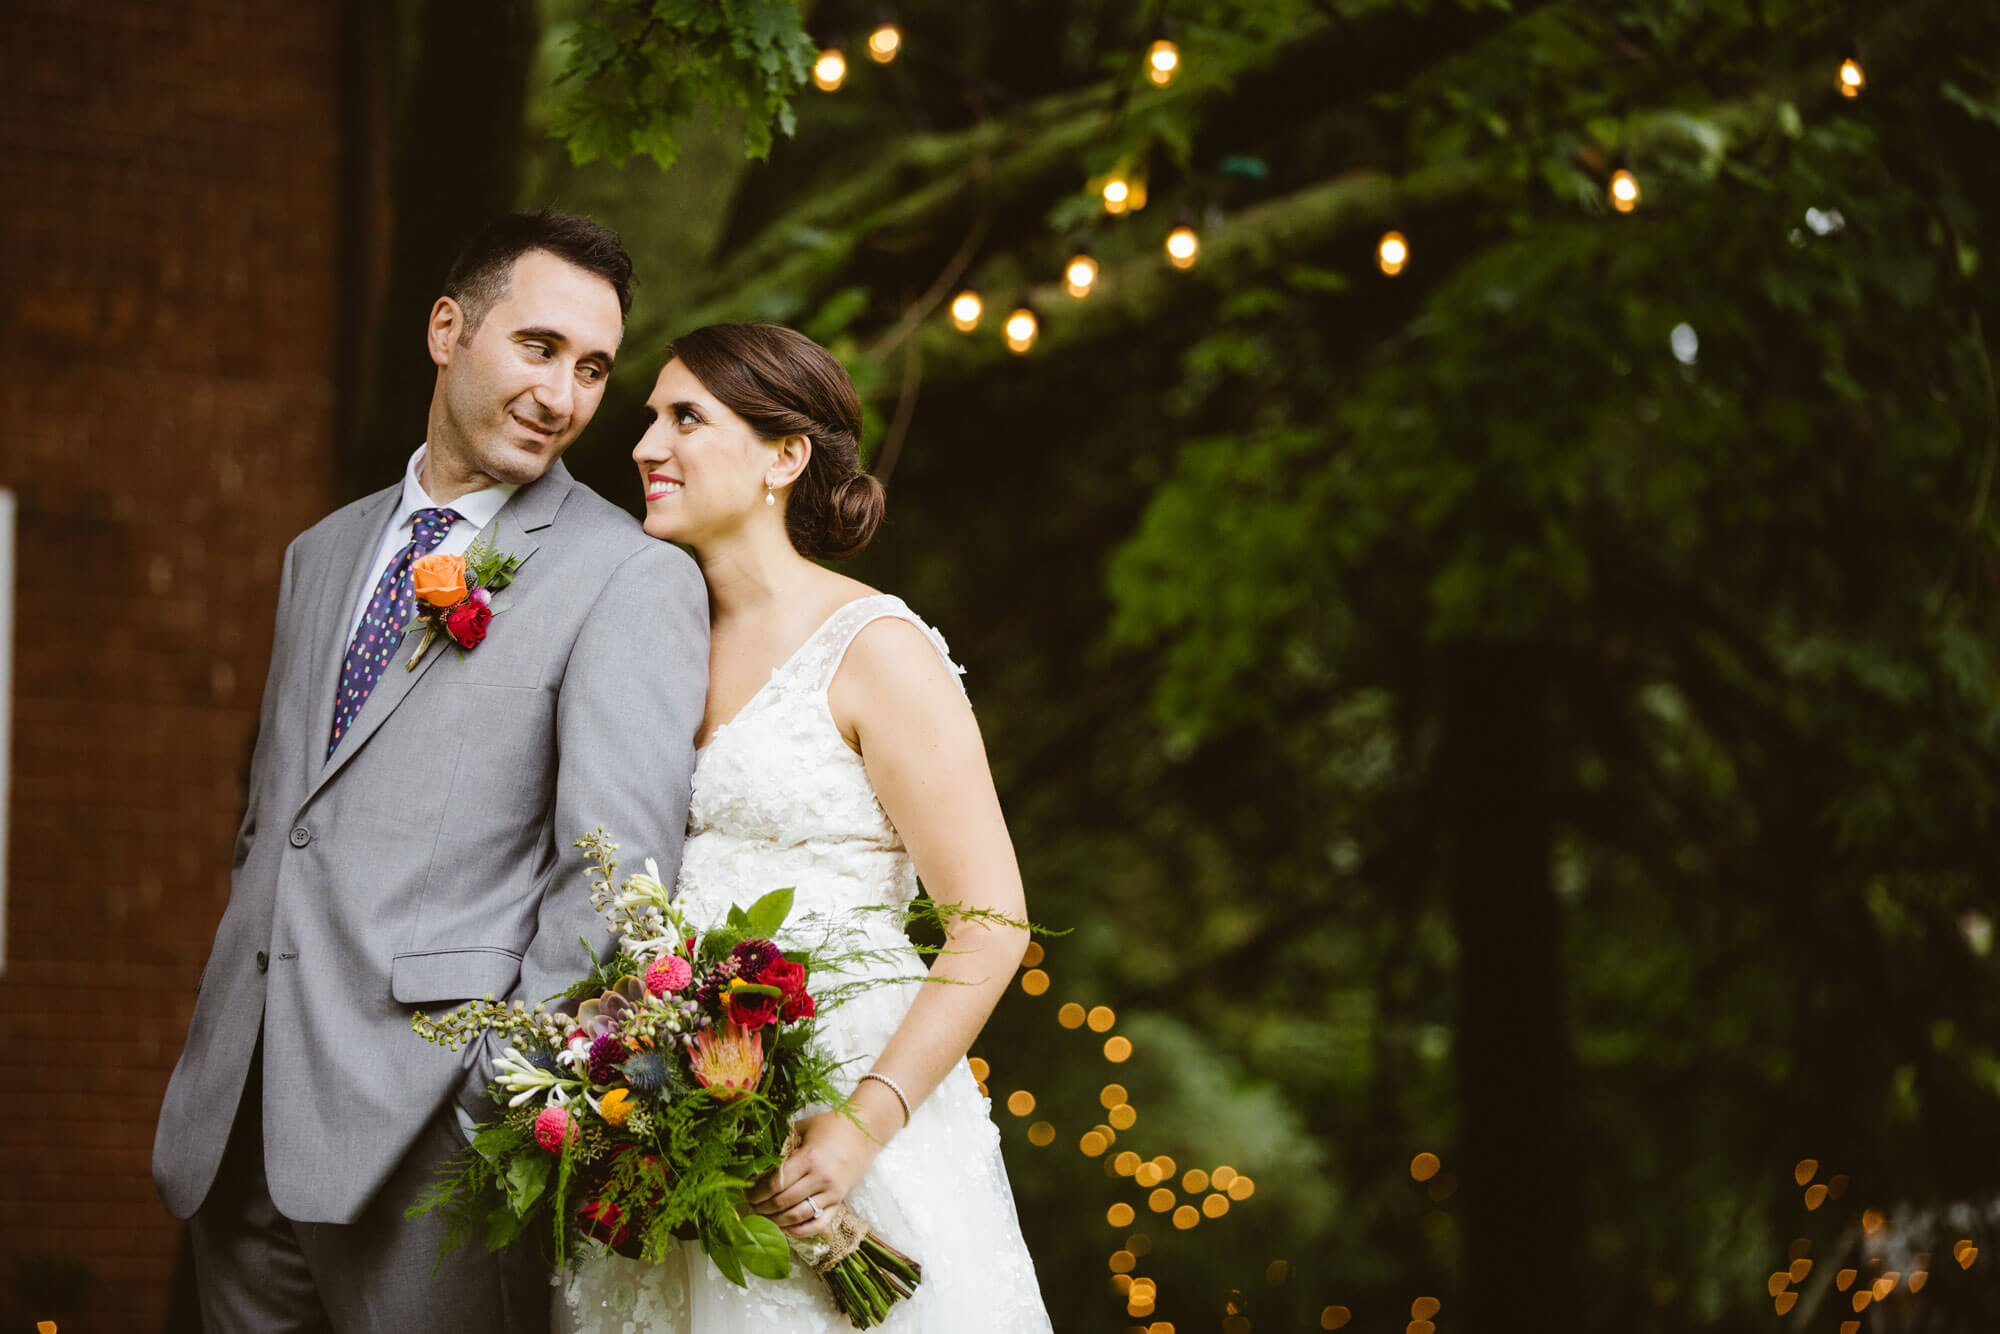 Erica-Kay-Photography---Kate-_-Joe-Wedding-1.jpg